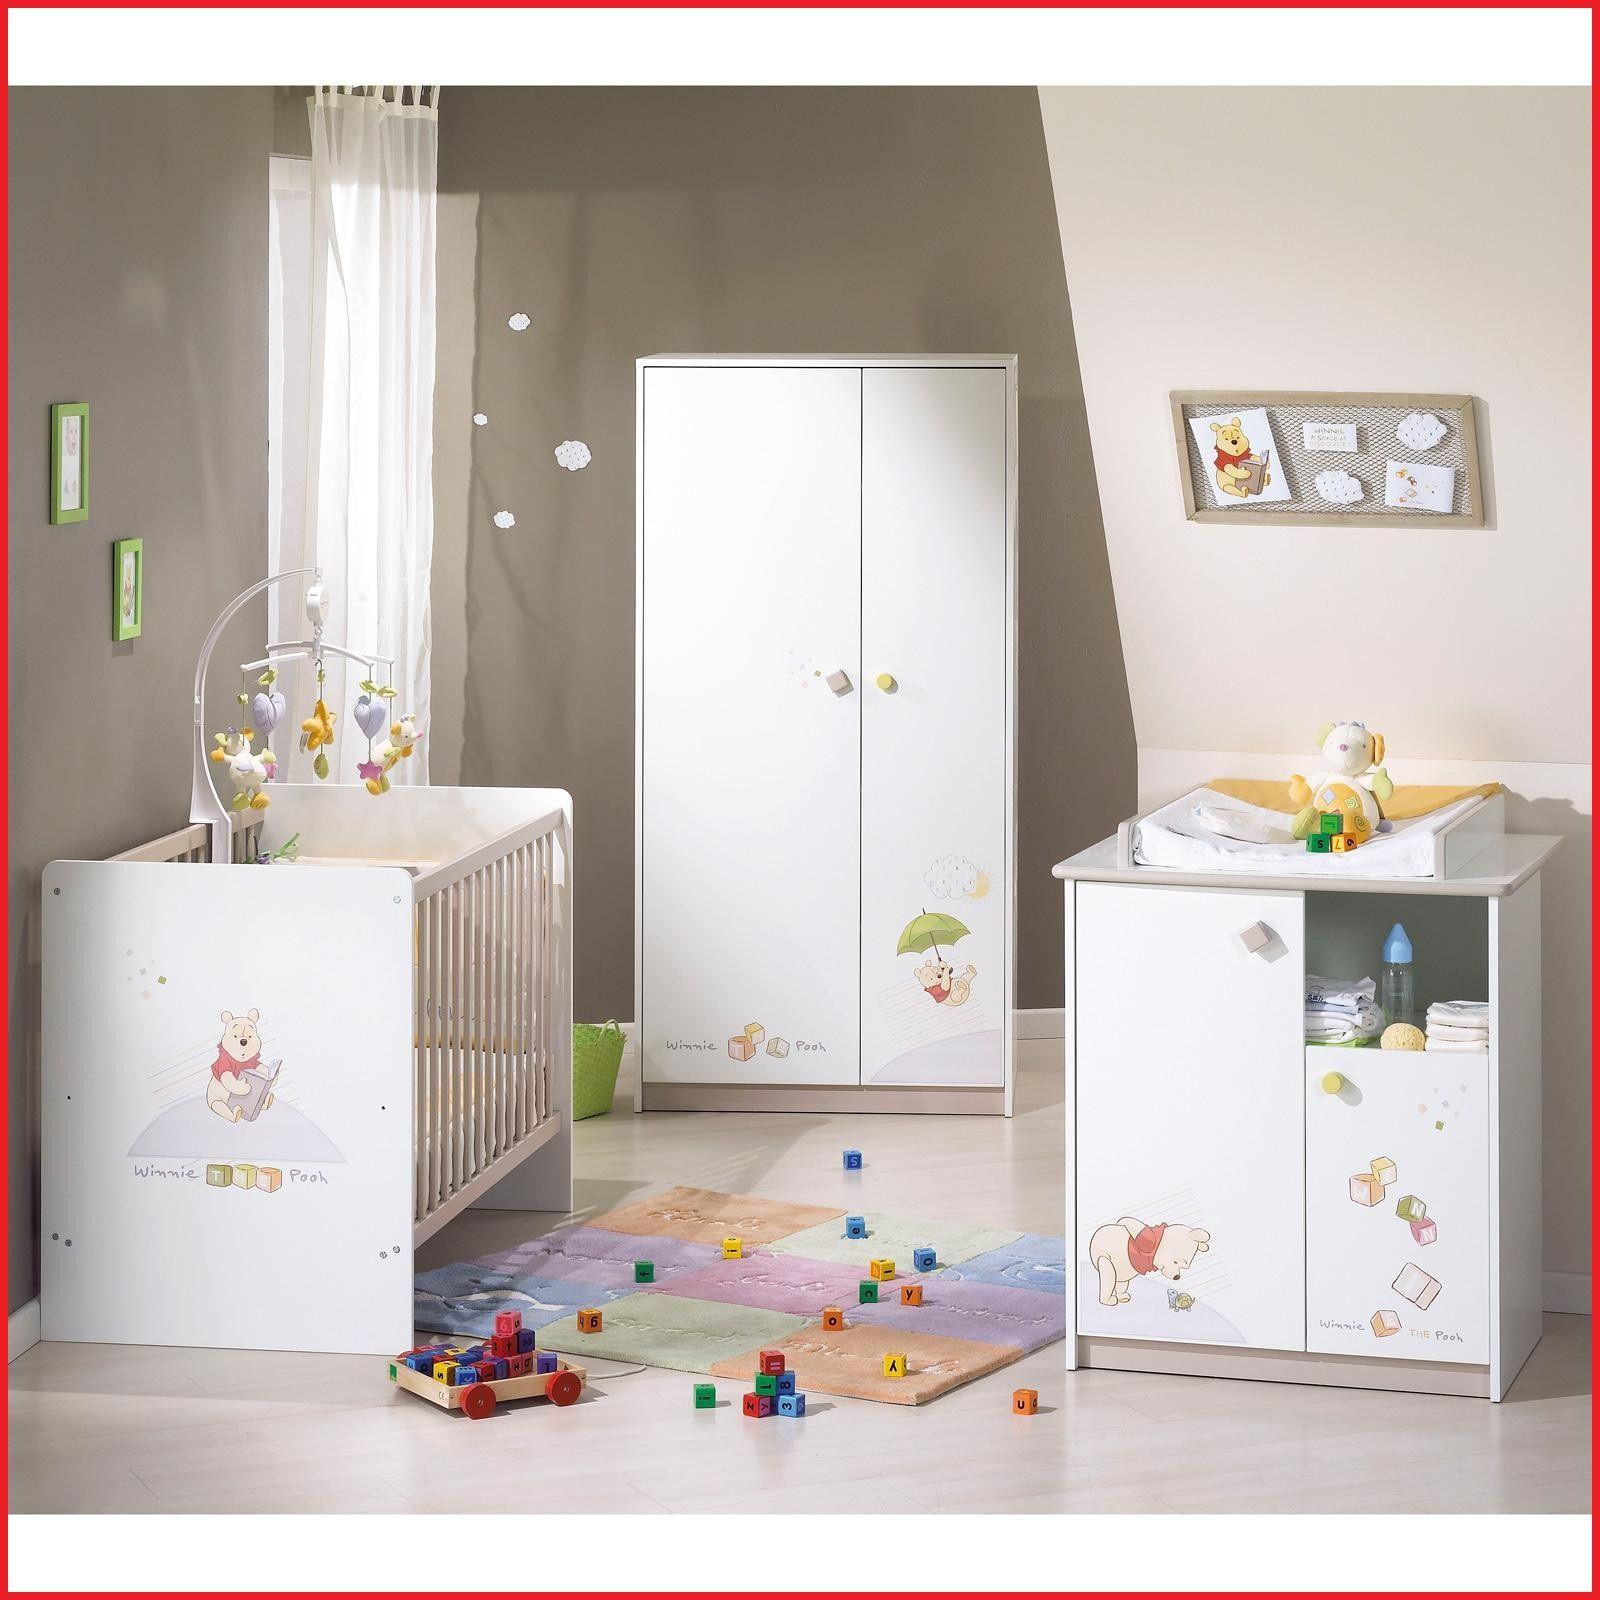 Pin By Prtha Lastnight On Kitchen Design Home Decor Baby